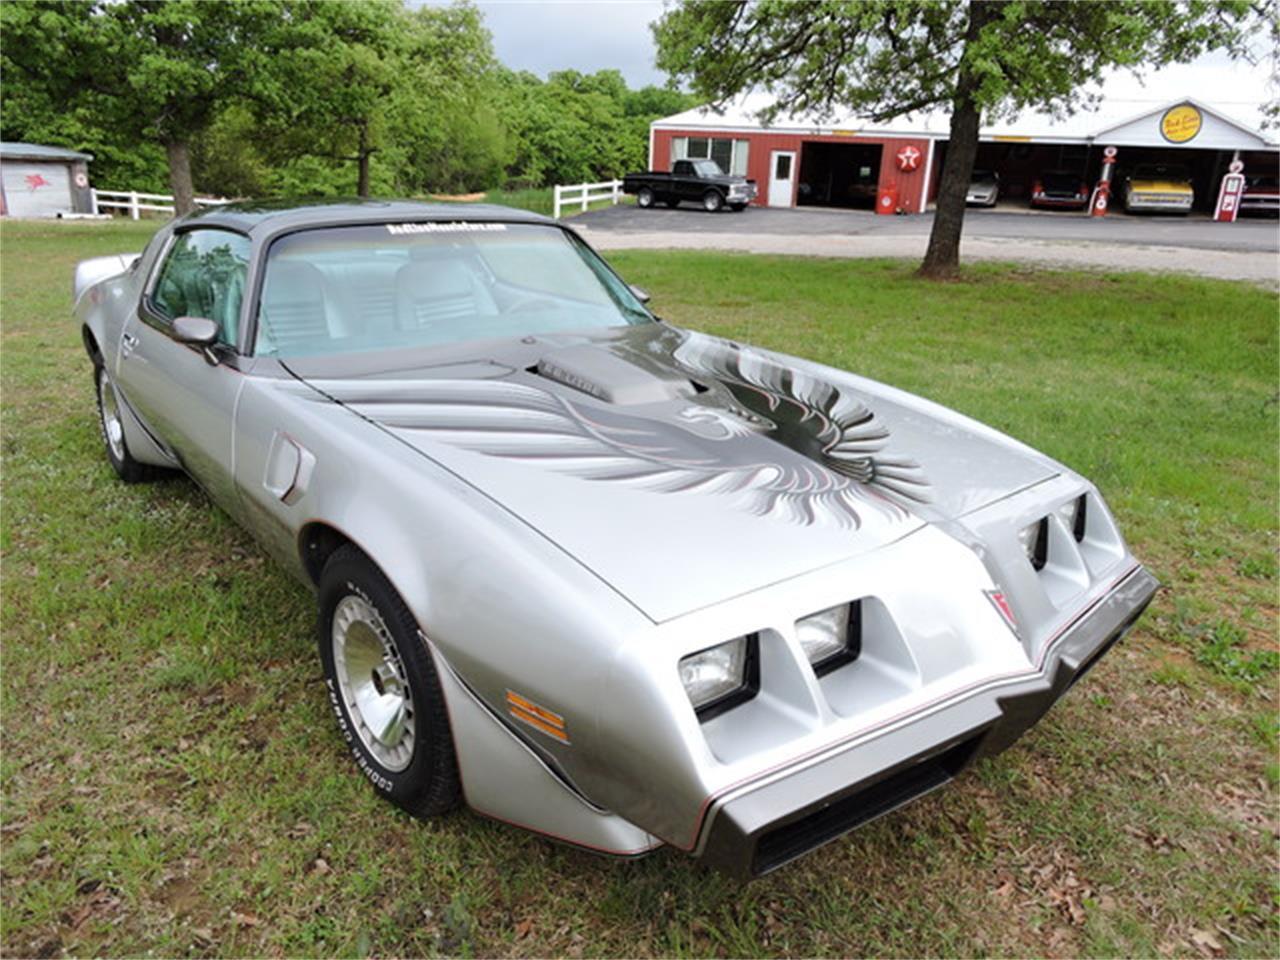 For sale 1979 pontiac firebird trans am in wilson oklahoma